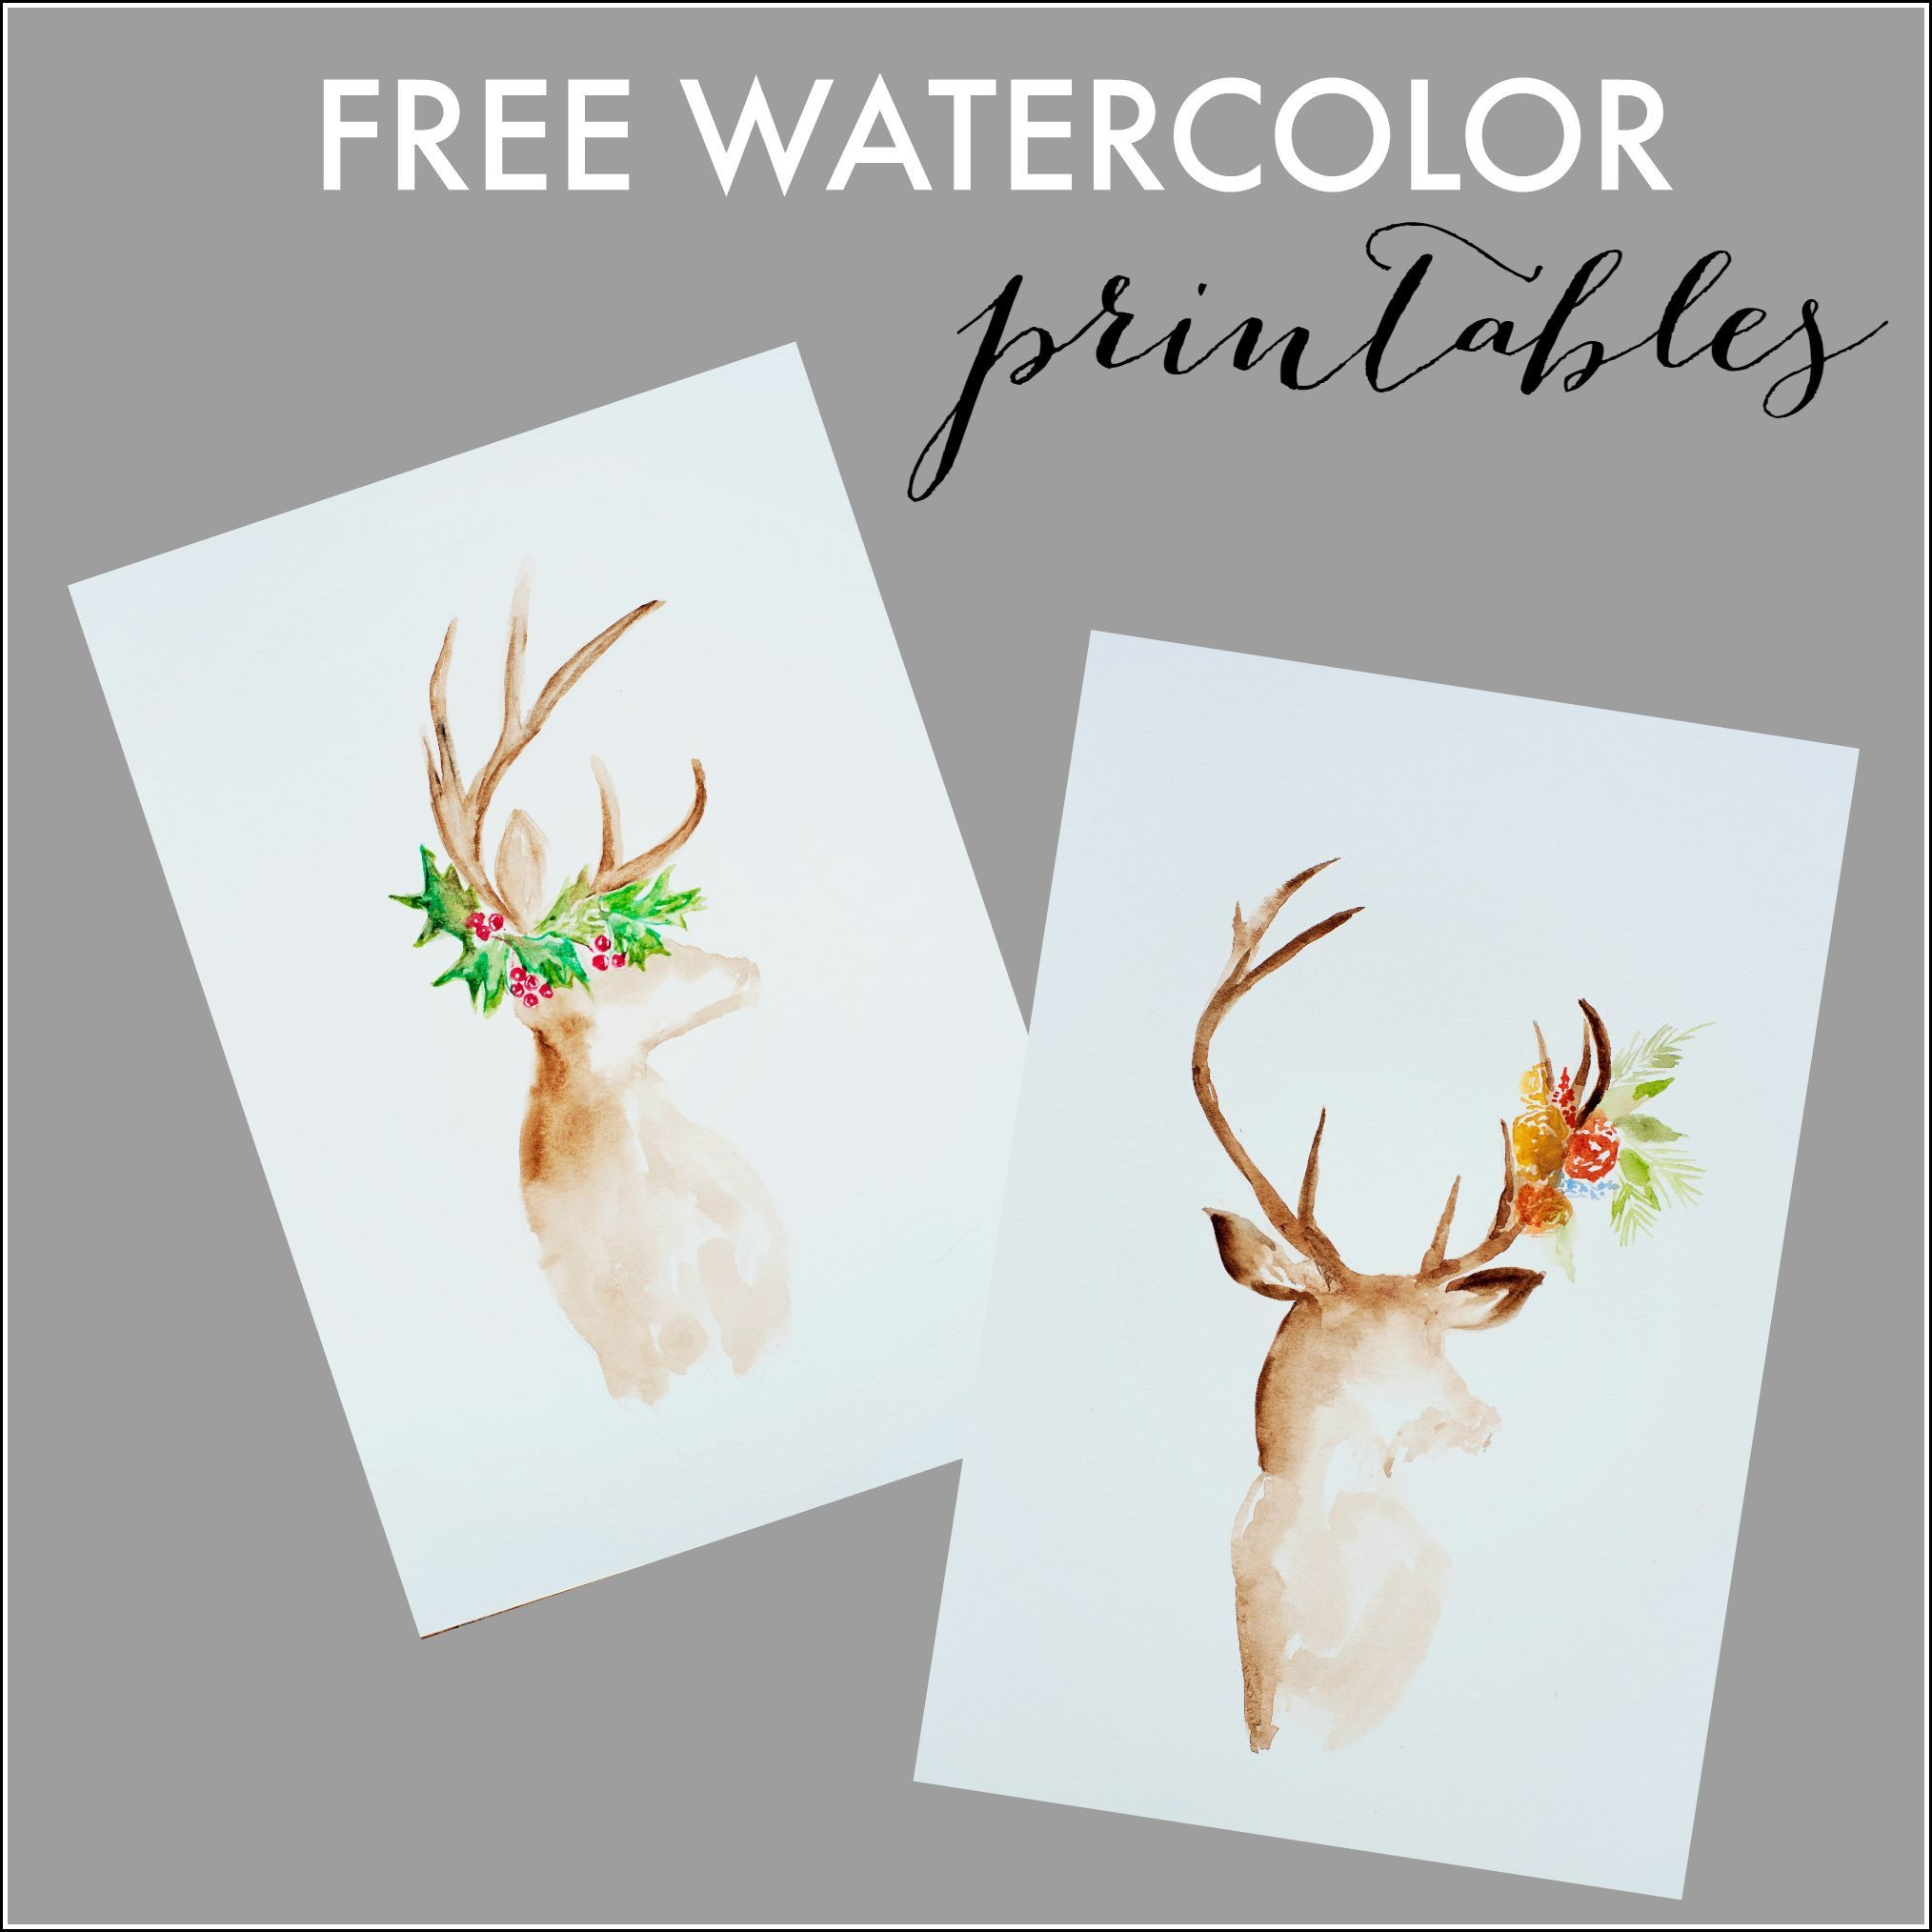 Free Watercolor Fall Printable | Printables | Calendario De Adviento - Free Watercolor Printables